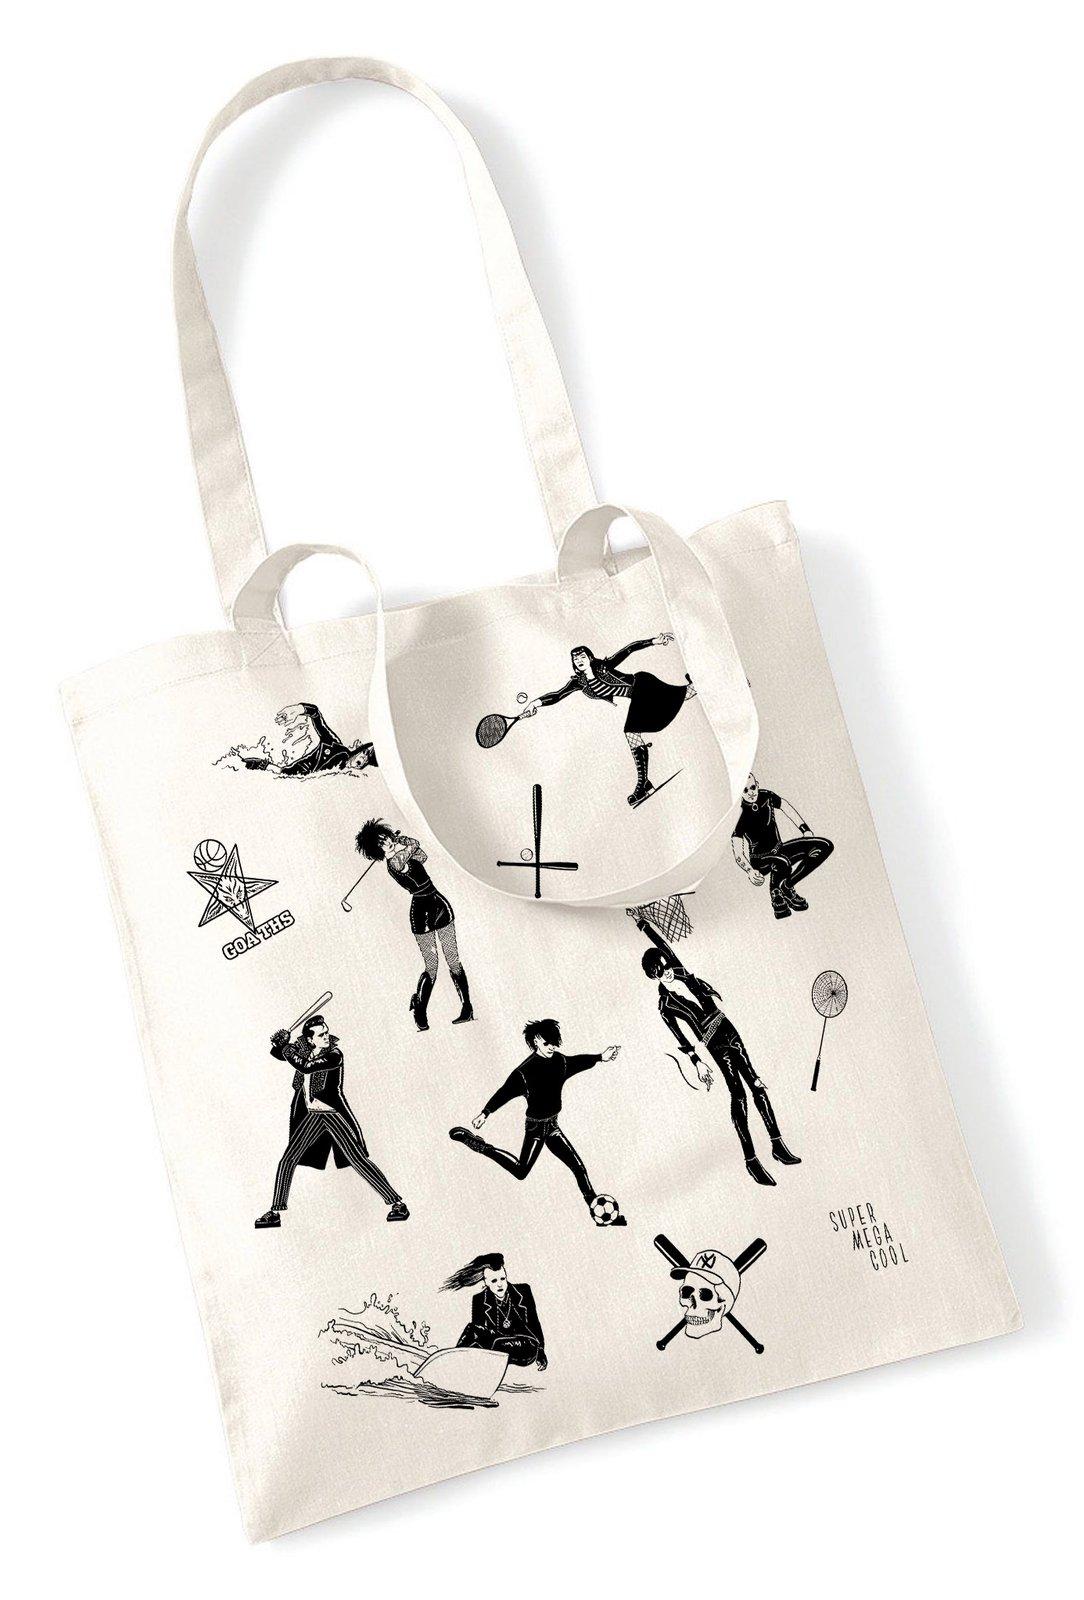 Le Cool Sportif Goth Shopping Mega Super Bag — 16qwU